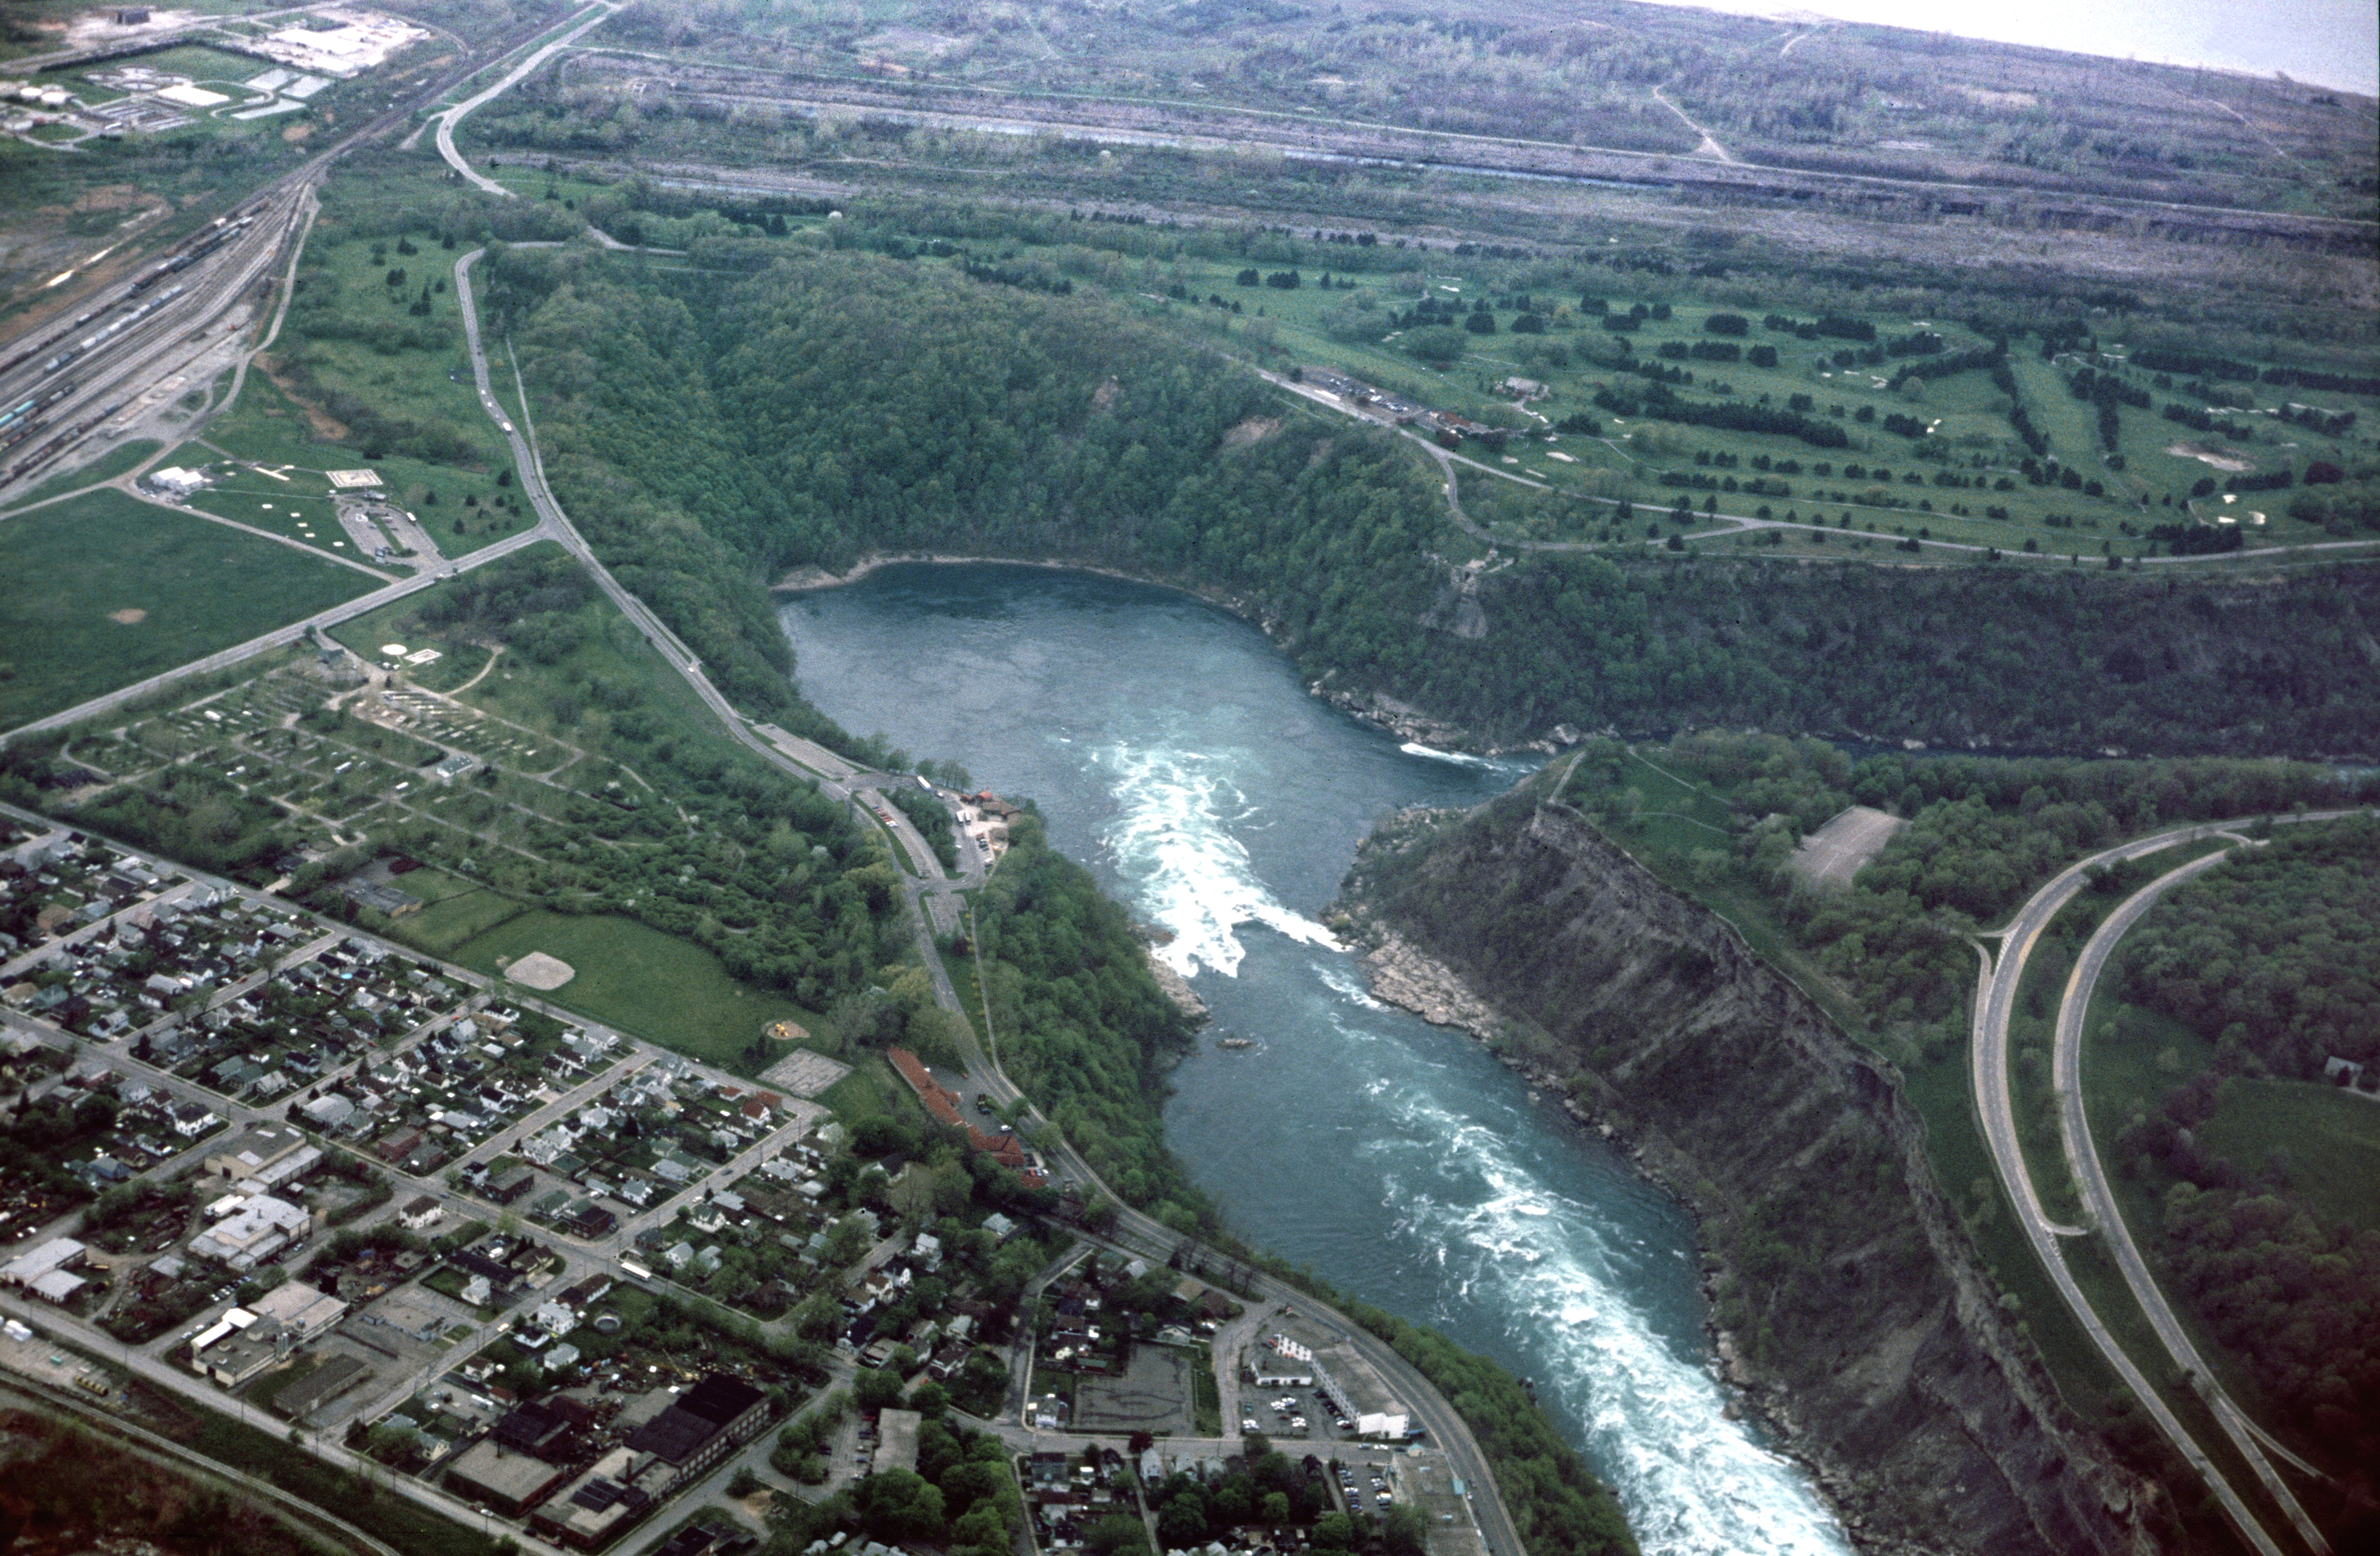 File:Niagara Falls Whirlpool aerial view.jpg - Wikimedia Commons